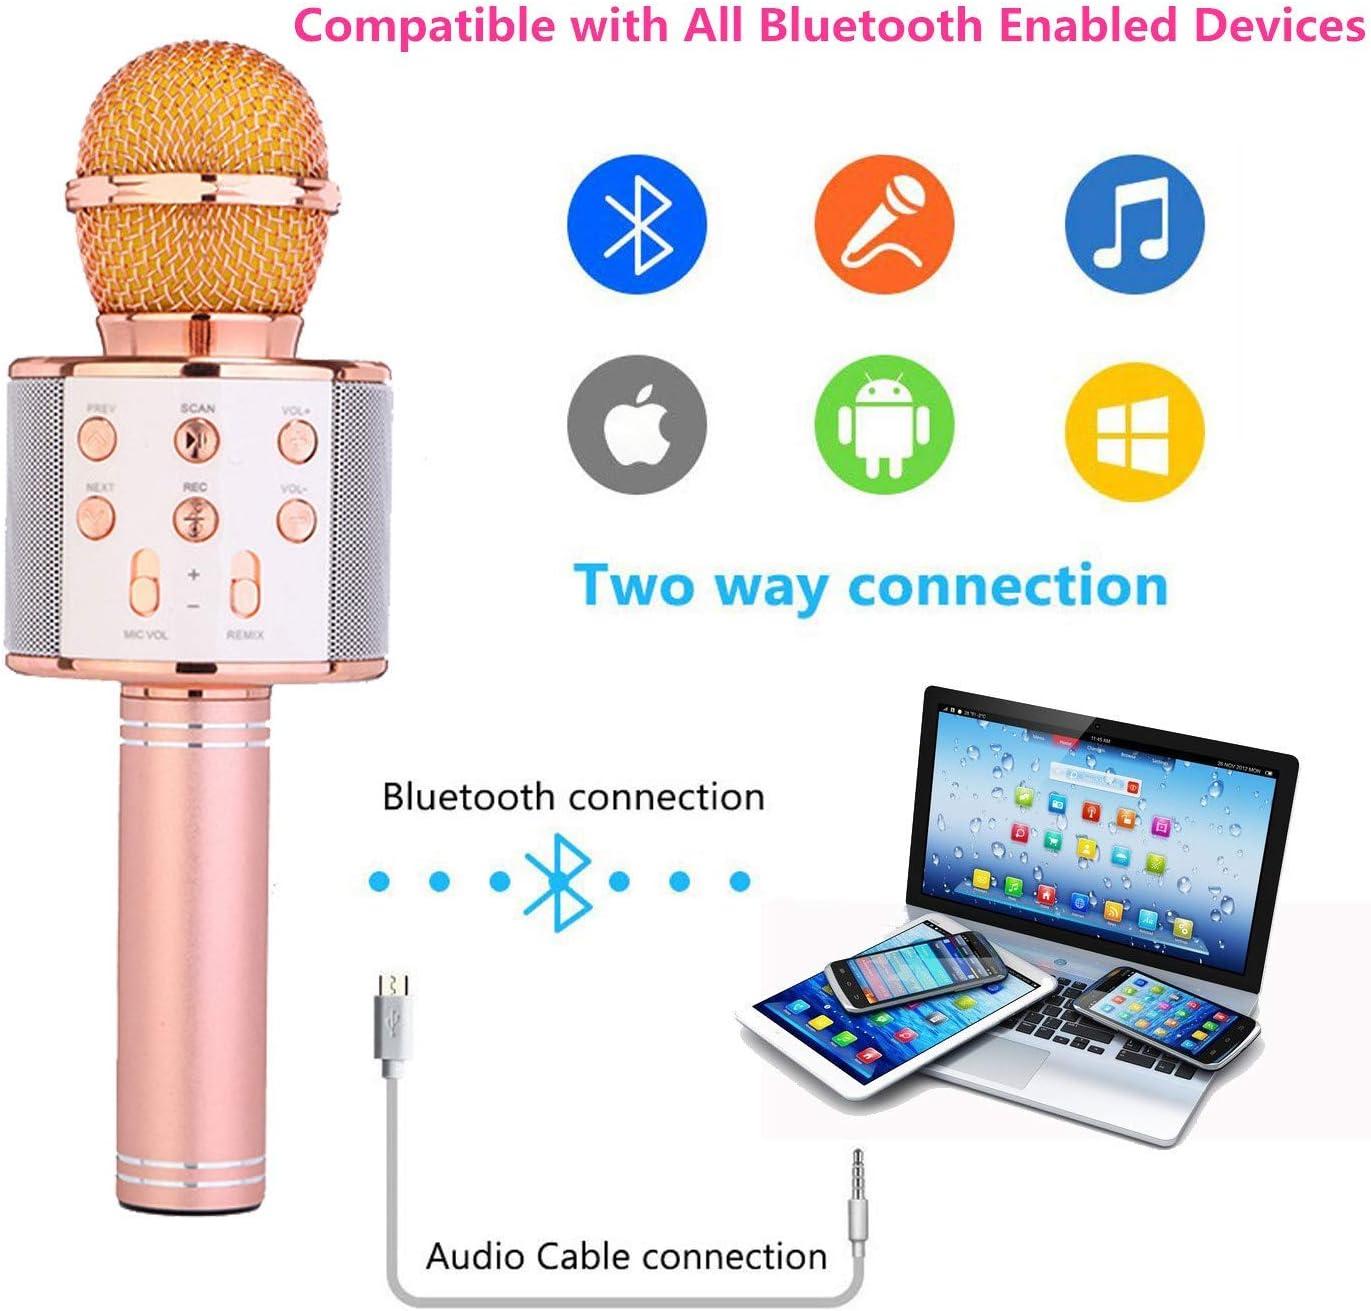 Altavoz Bluetooth Reproductor de M/úsica Canto Grabadora para el IPHONE Android IPAD Smartphone PC Bluetooth Karaoke Micr/ófono,Micr/ófono Karaoke,Inal/ámbrico Micr/ófono Karaoke C